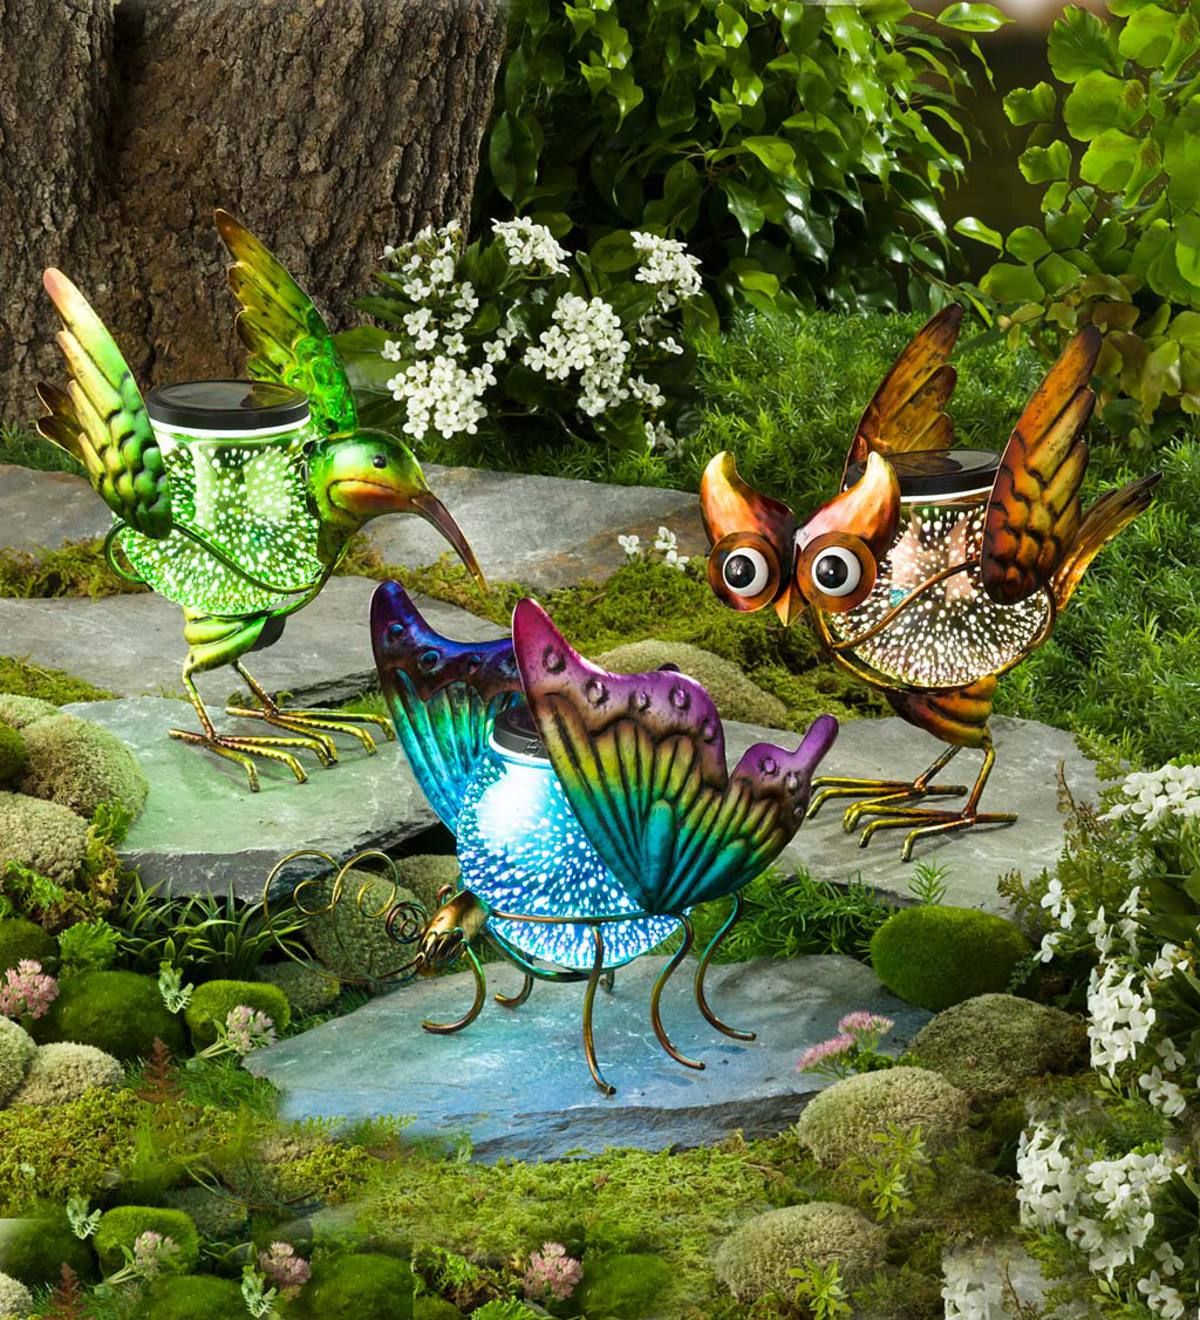 solar globe animal garden accent - Garden Accents